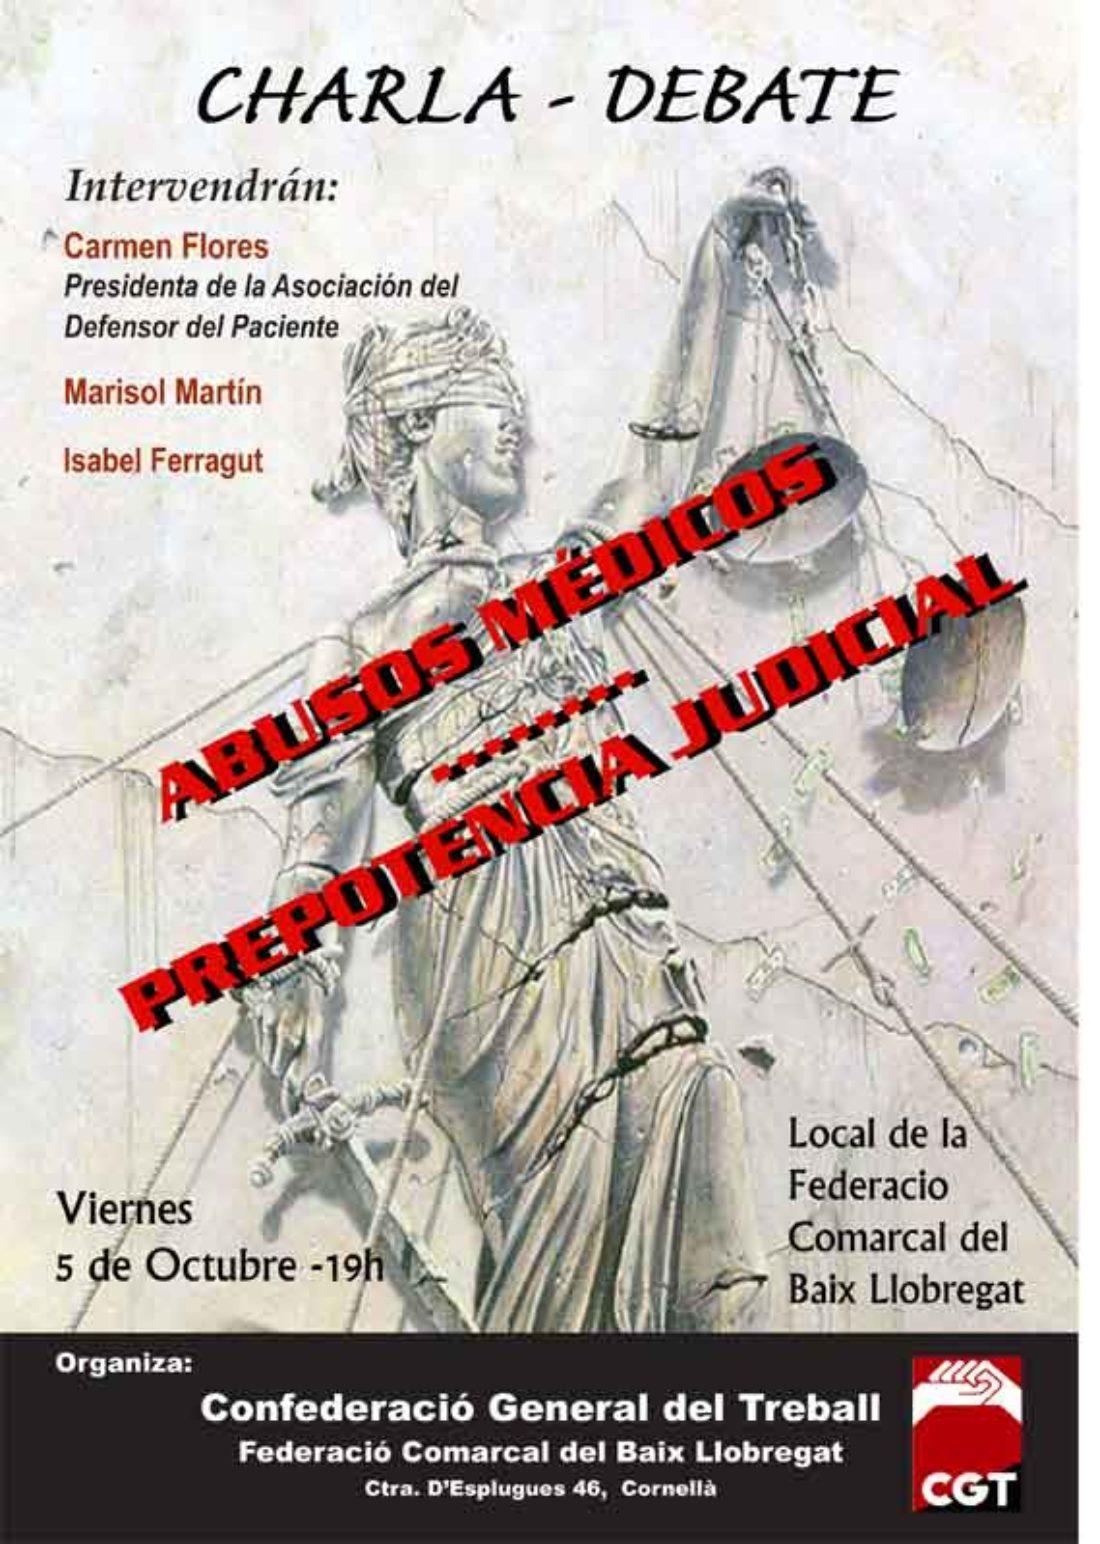 Charla – debate abusos médicos, prepotencia judicial